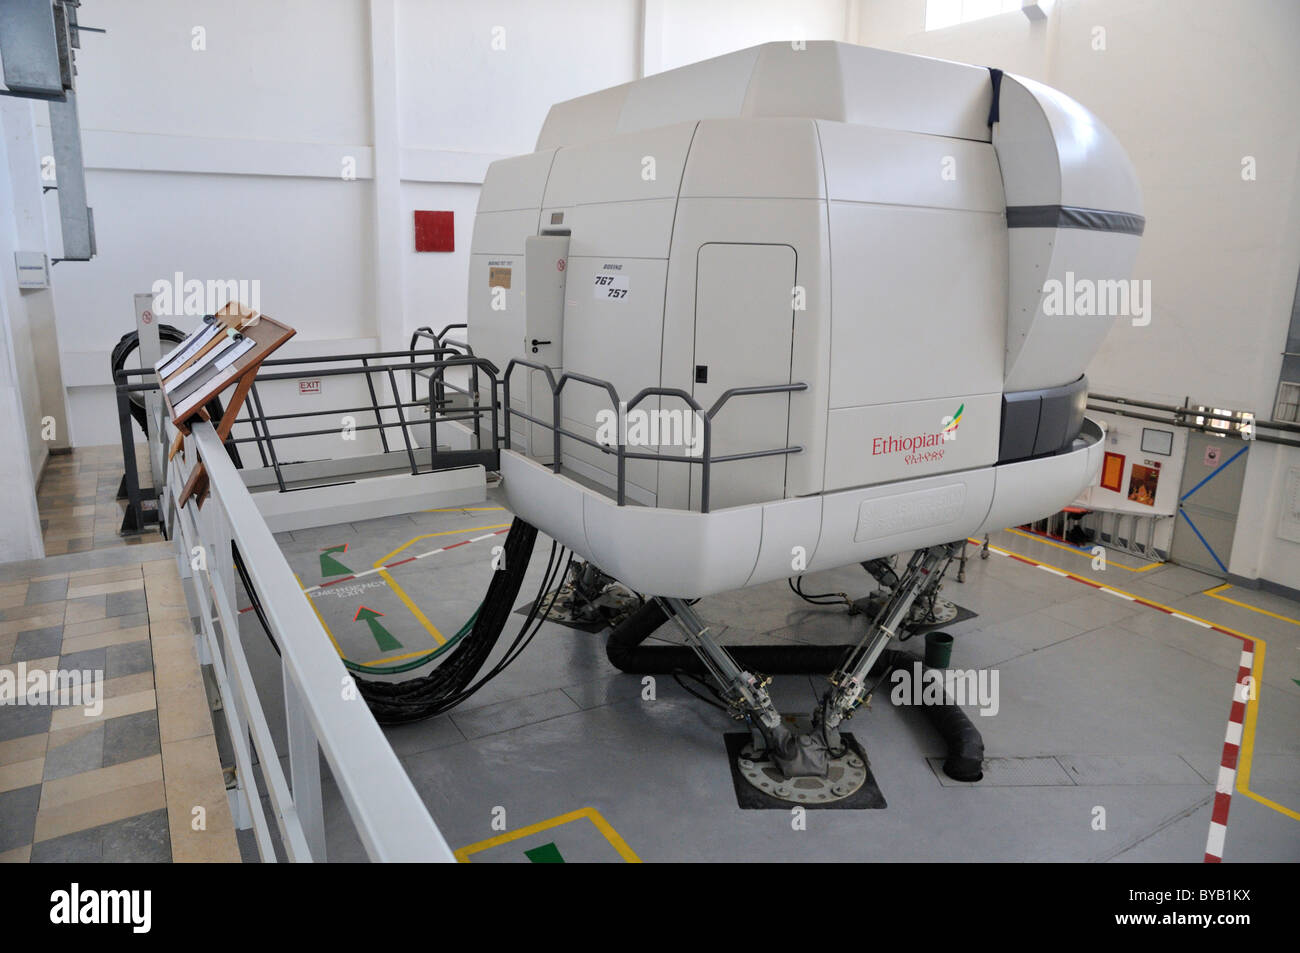 Ethiopian Airlines flight simulator at the airport in Addis Ababa, Ethiopia, Africa - Stock Image